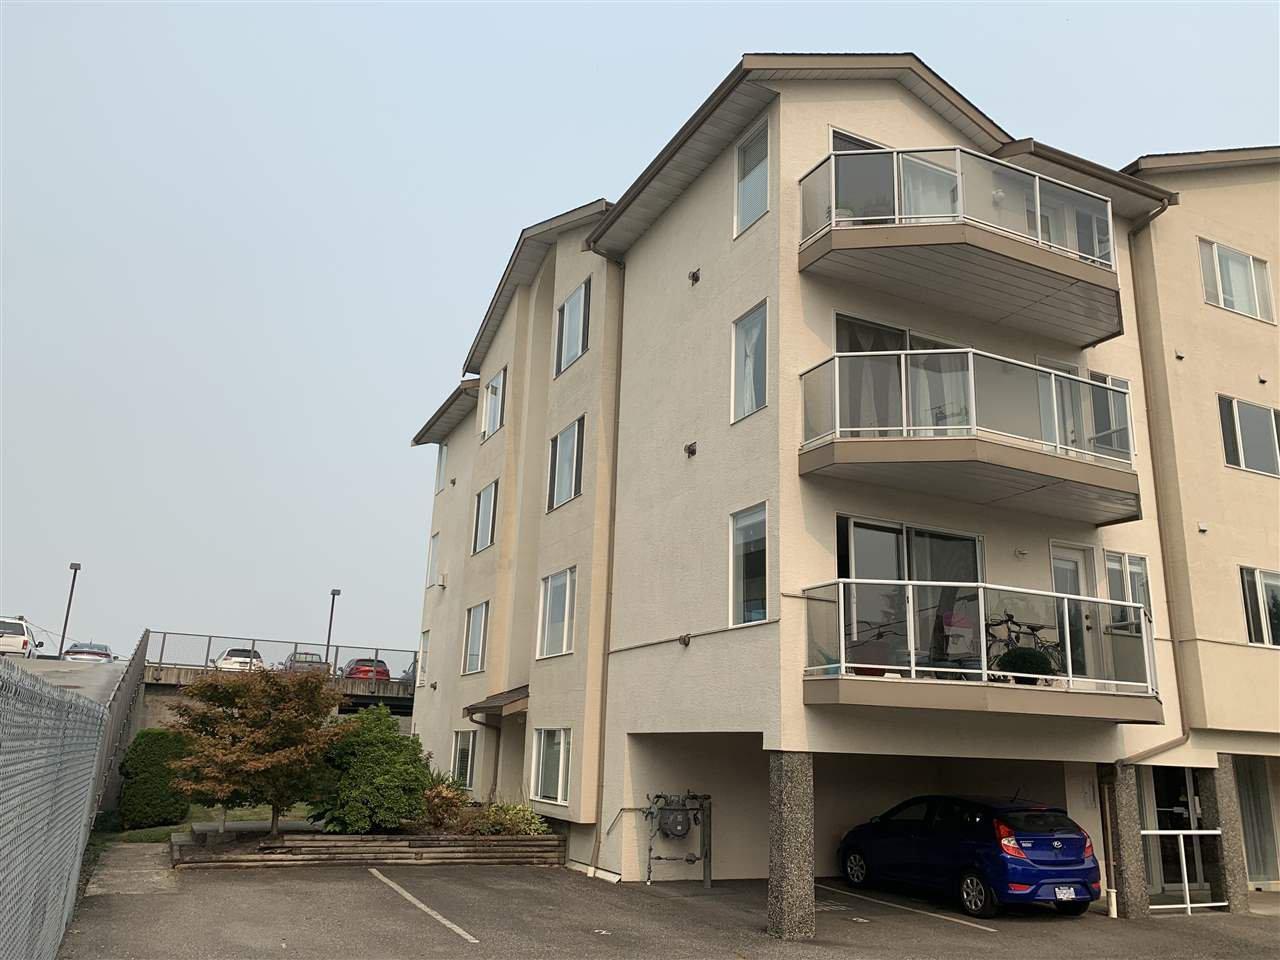 Main Photo: 304 45729 GAETZ Street in Chilliwack: Sardis East Vedder Rd Condo for sale (Sardis)  : MLS®# R2500305